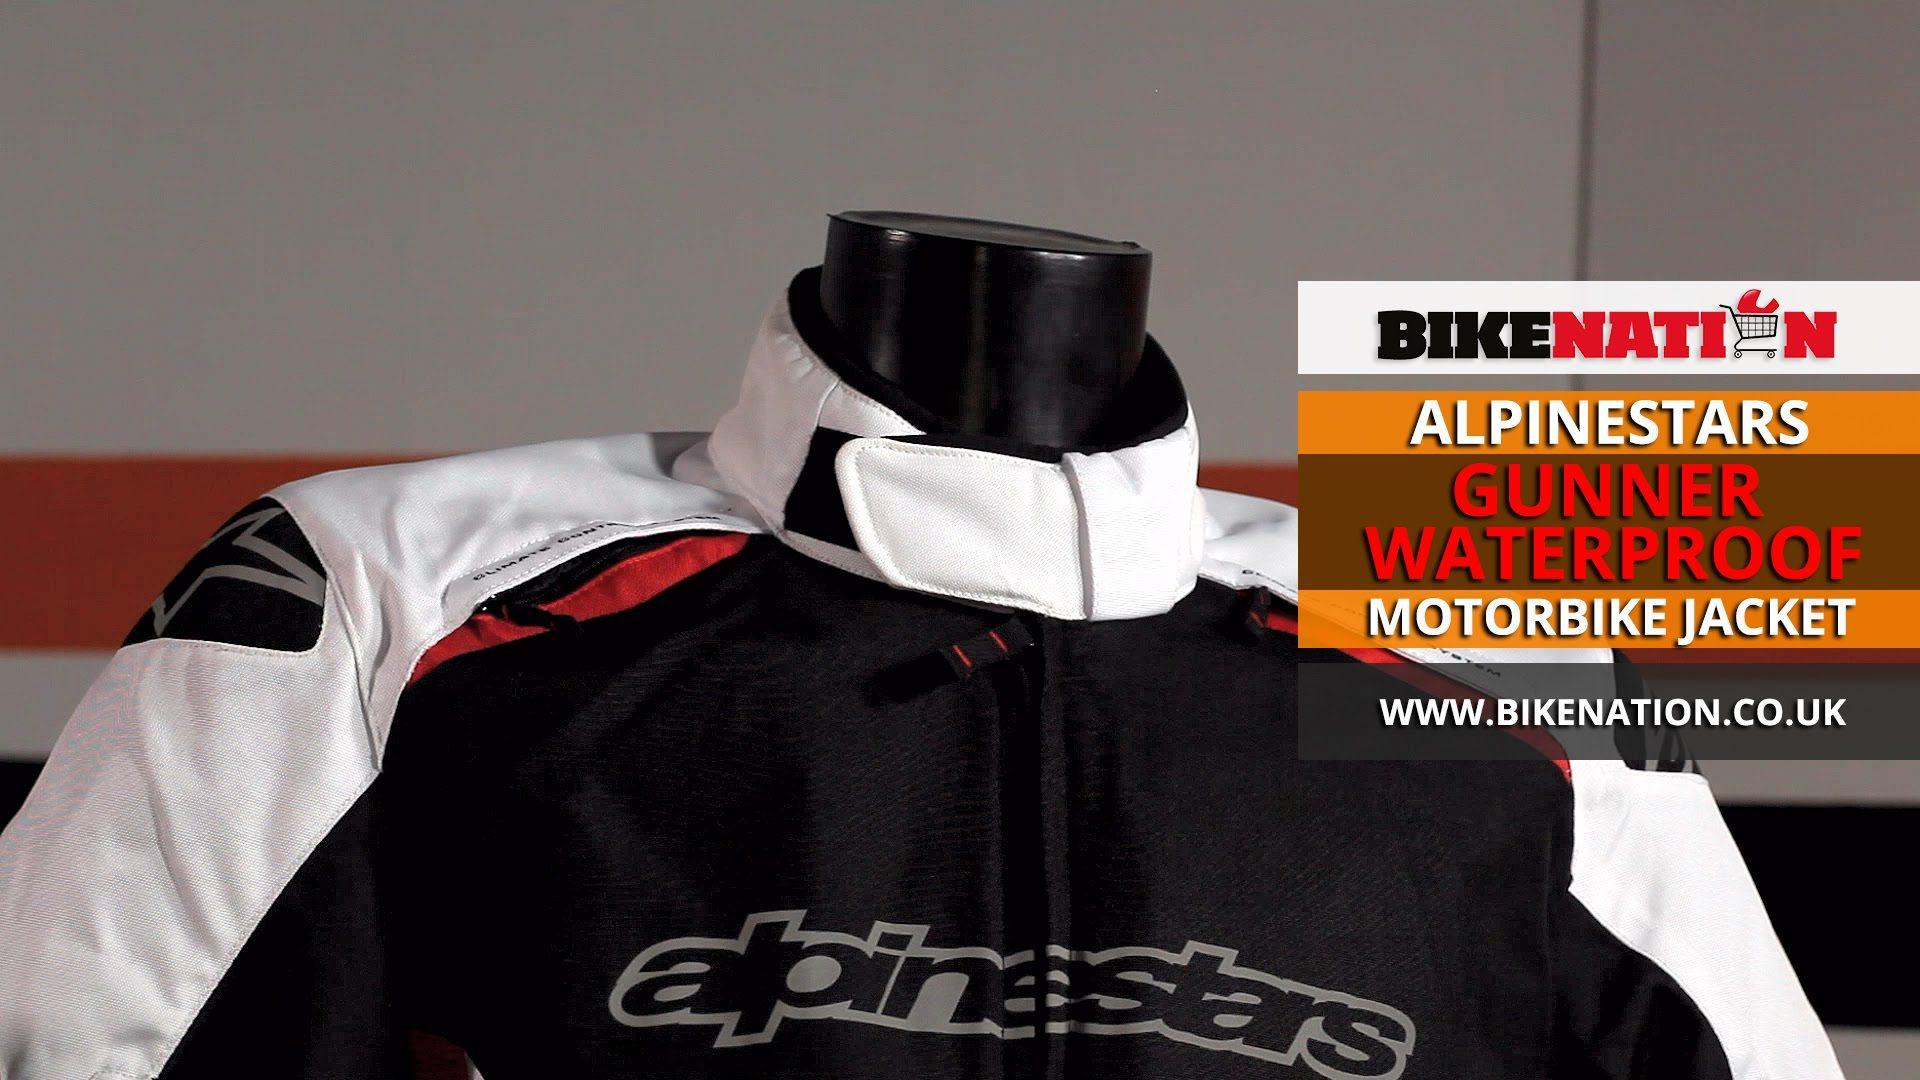 Alpinestars - Gunner WP Jacket  #Alpinestars #Gunner #waterproof #jacket #motorbike #bikenation